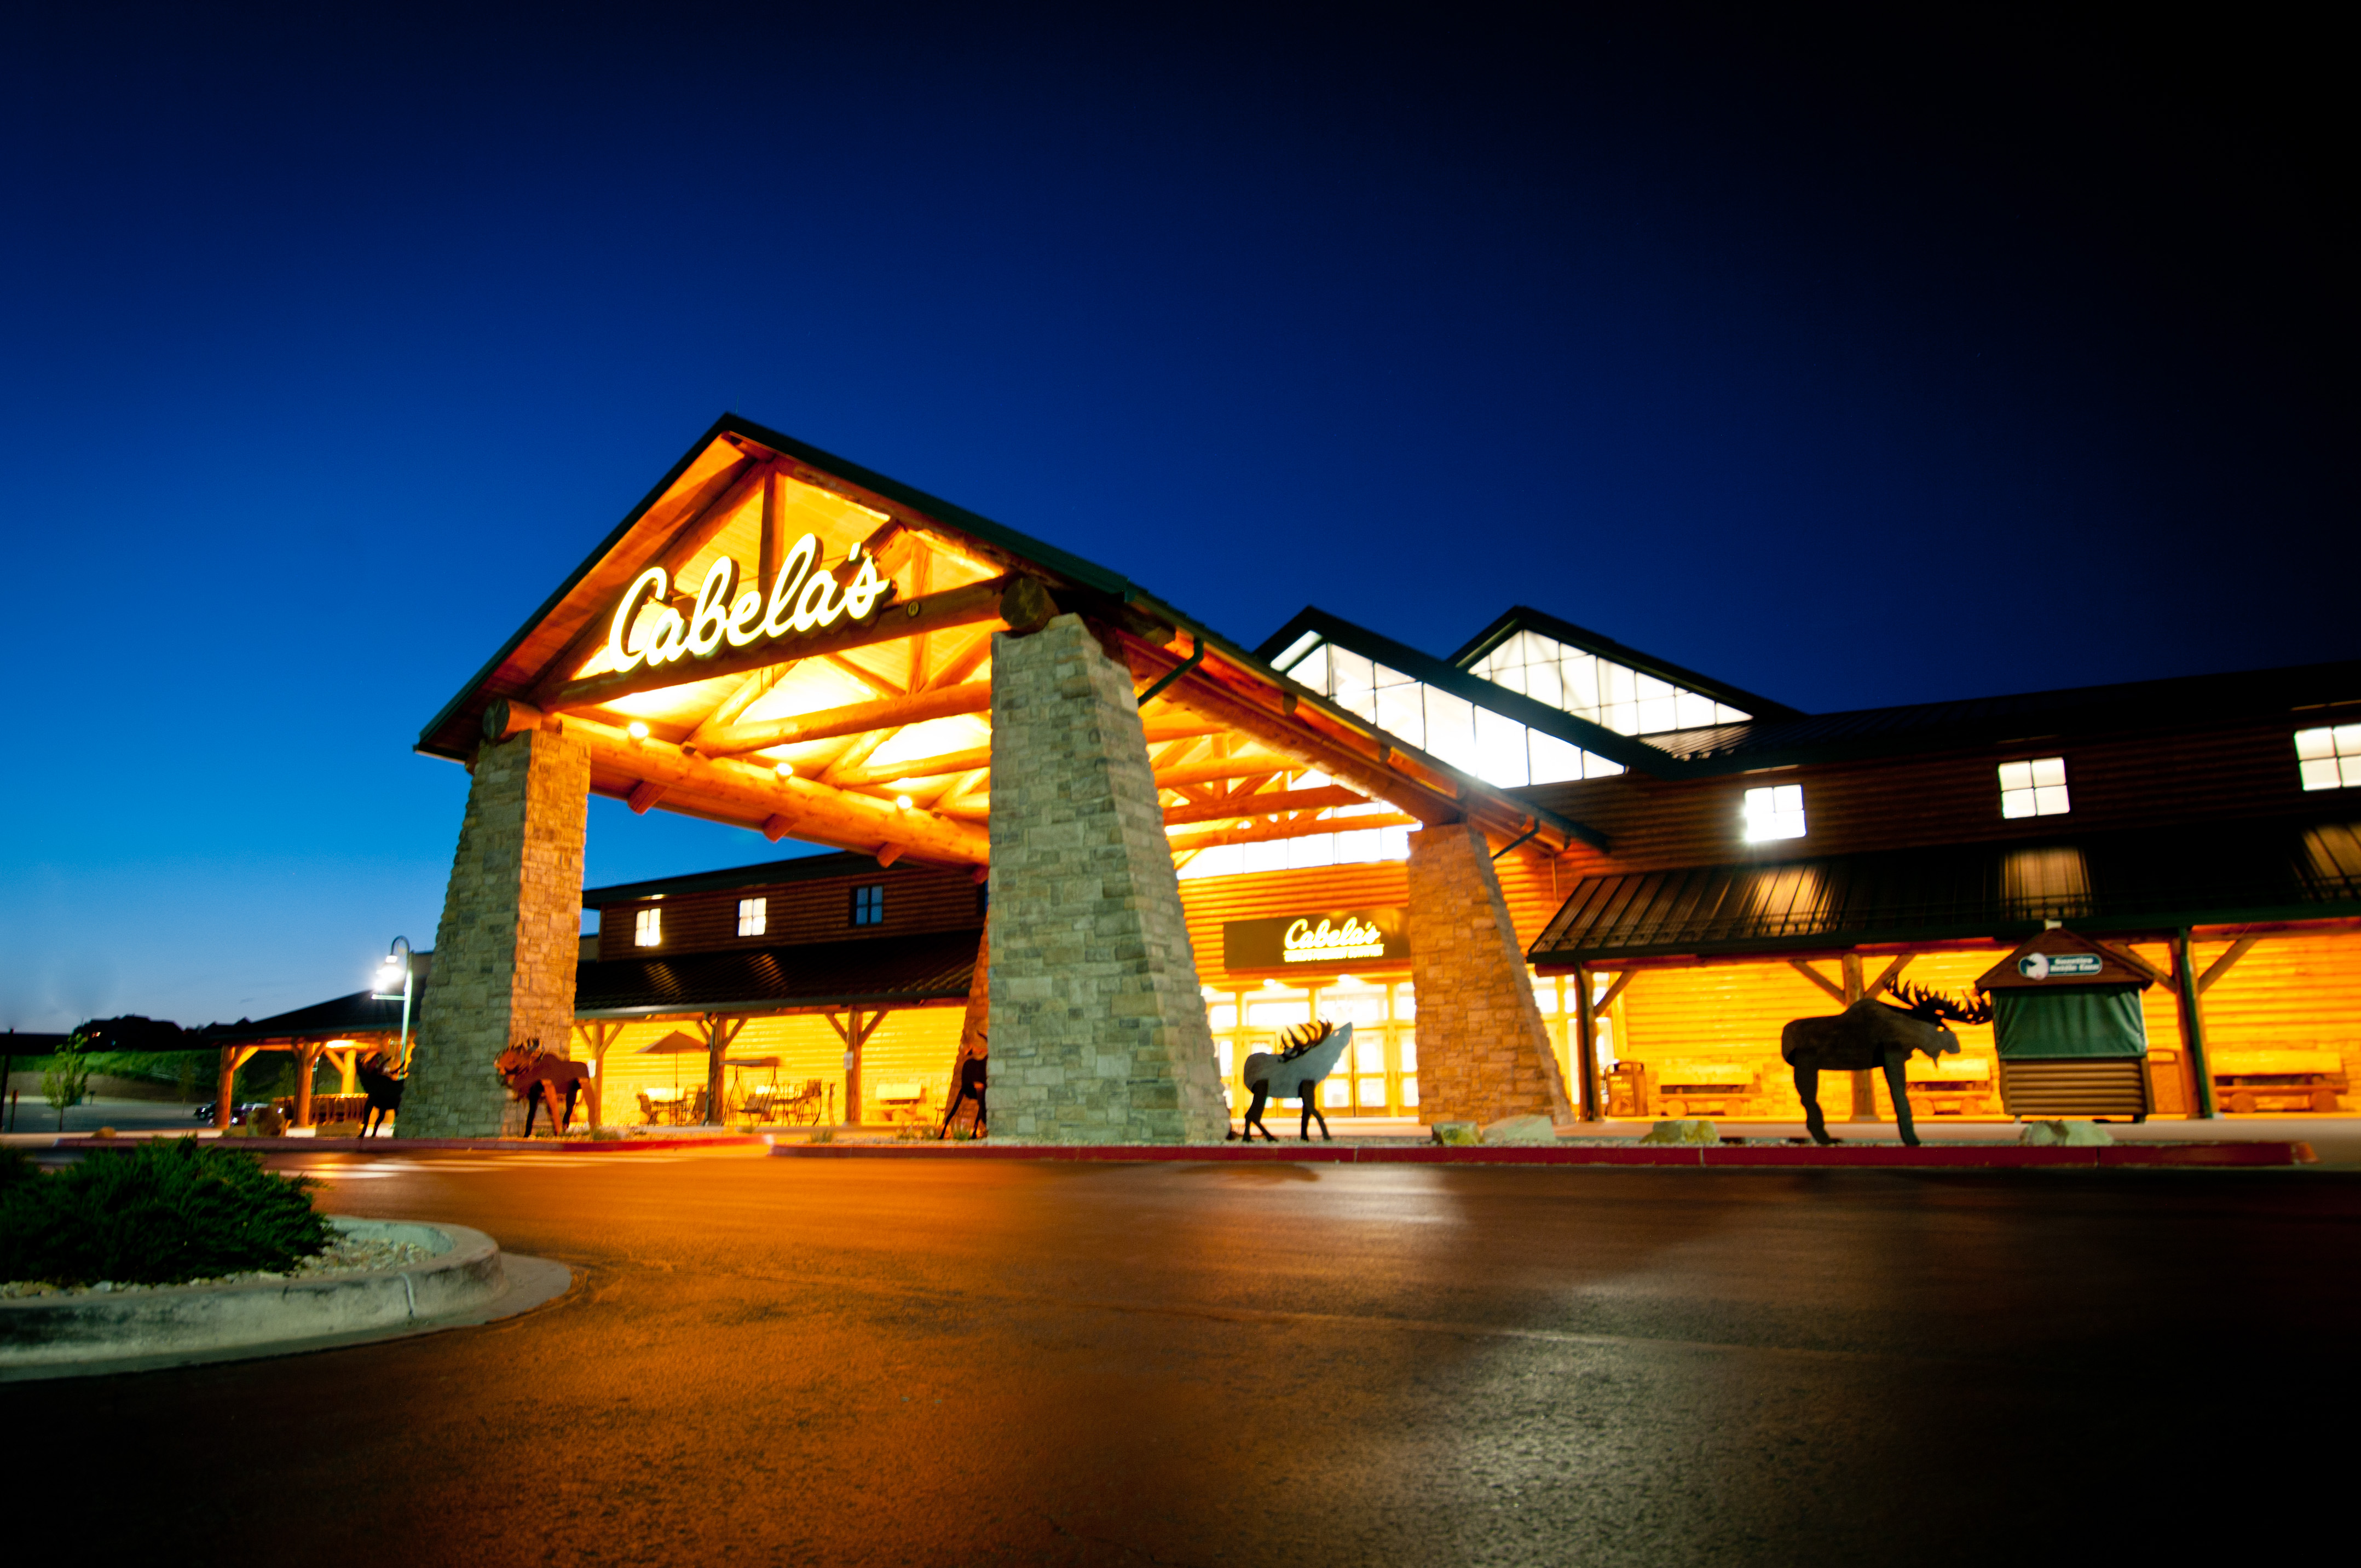 Cabella's